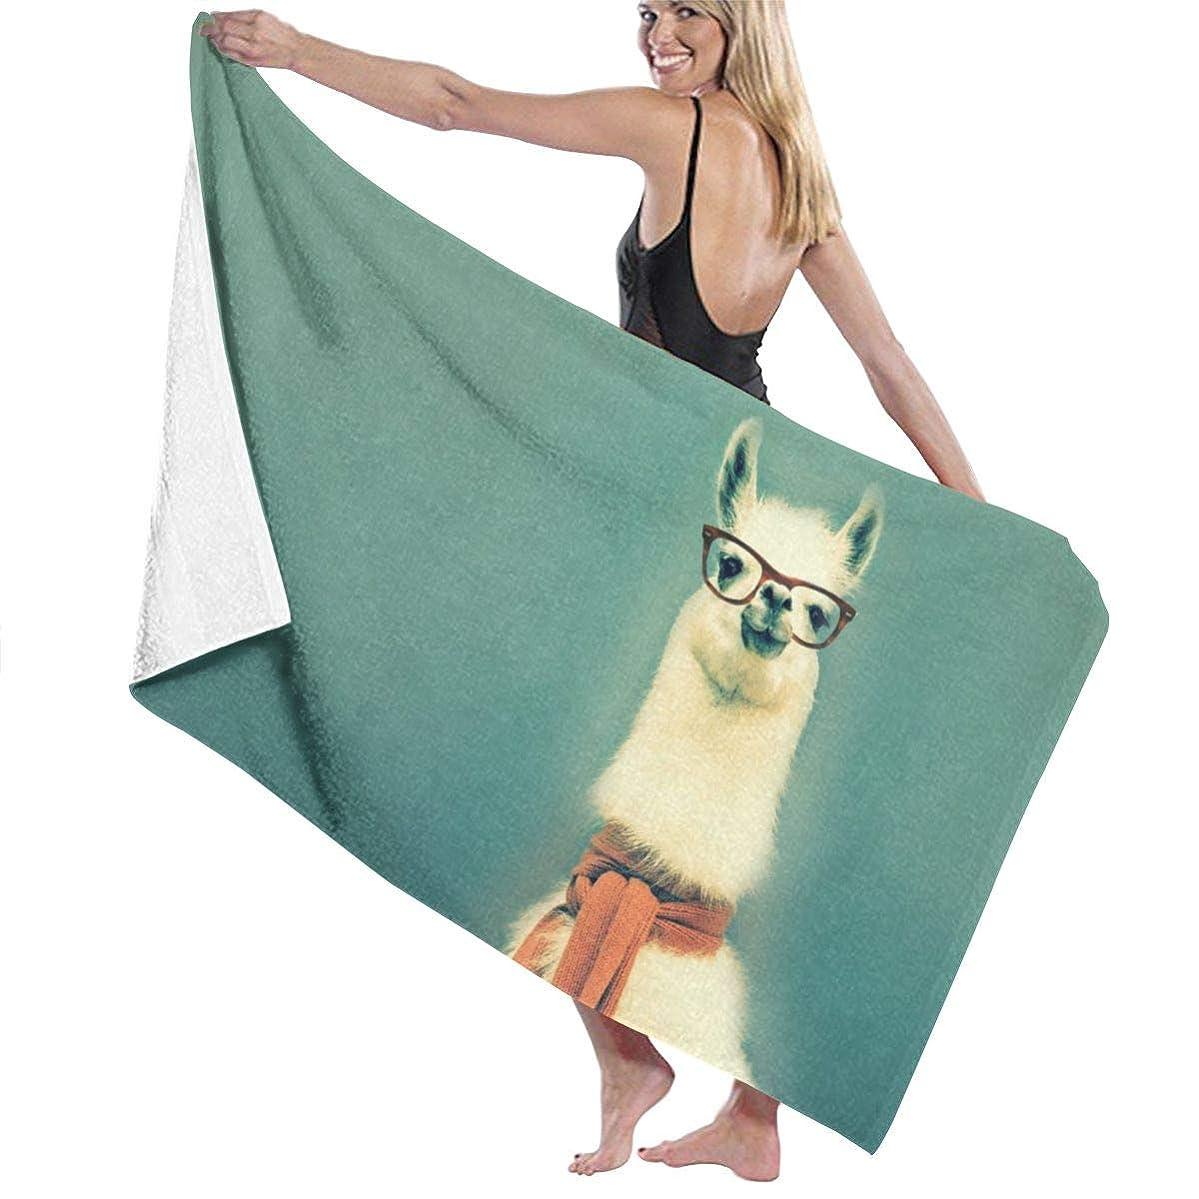 Beach Towels for Women Men Llama Alpaca Bath Towels Quick Dry Multipurpose Travel Pool Blanket Large 31x51 Inches